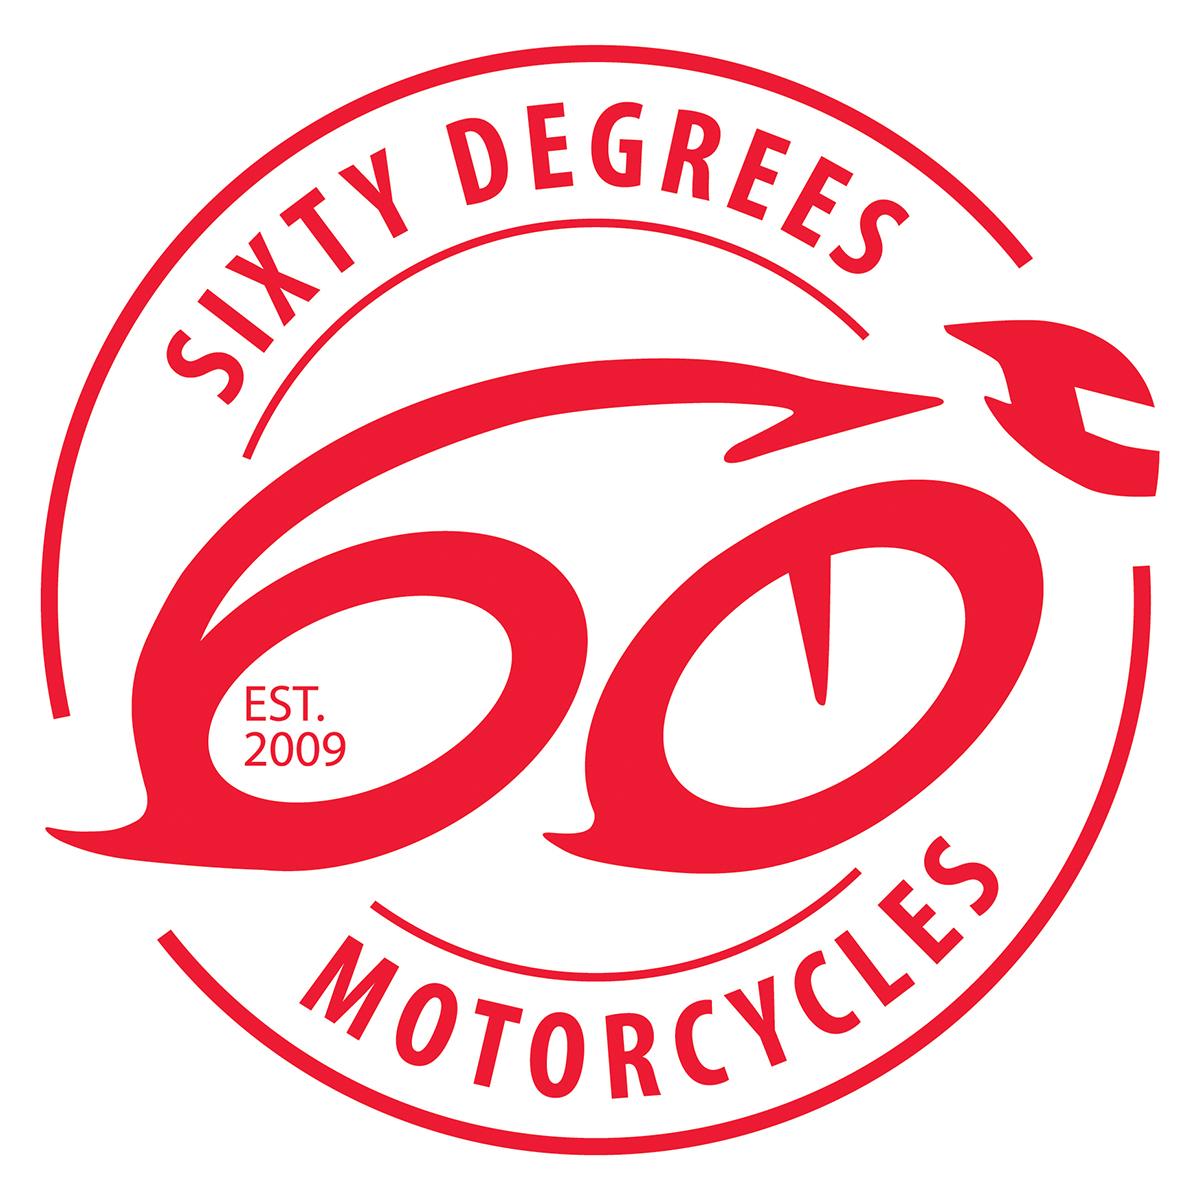 Sixty-Degrees-Motorcycles-logo-design-branding.jpg